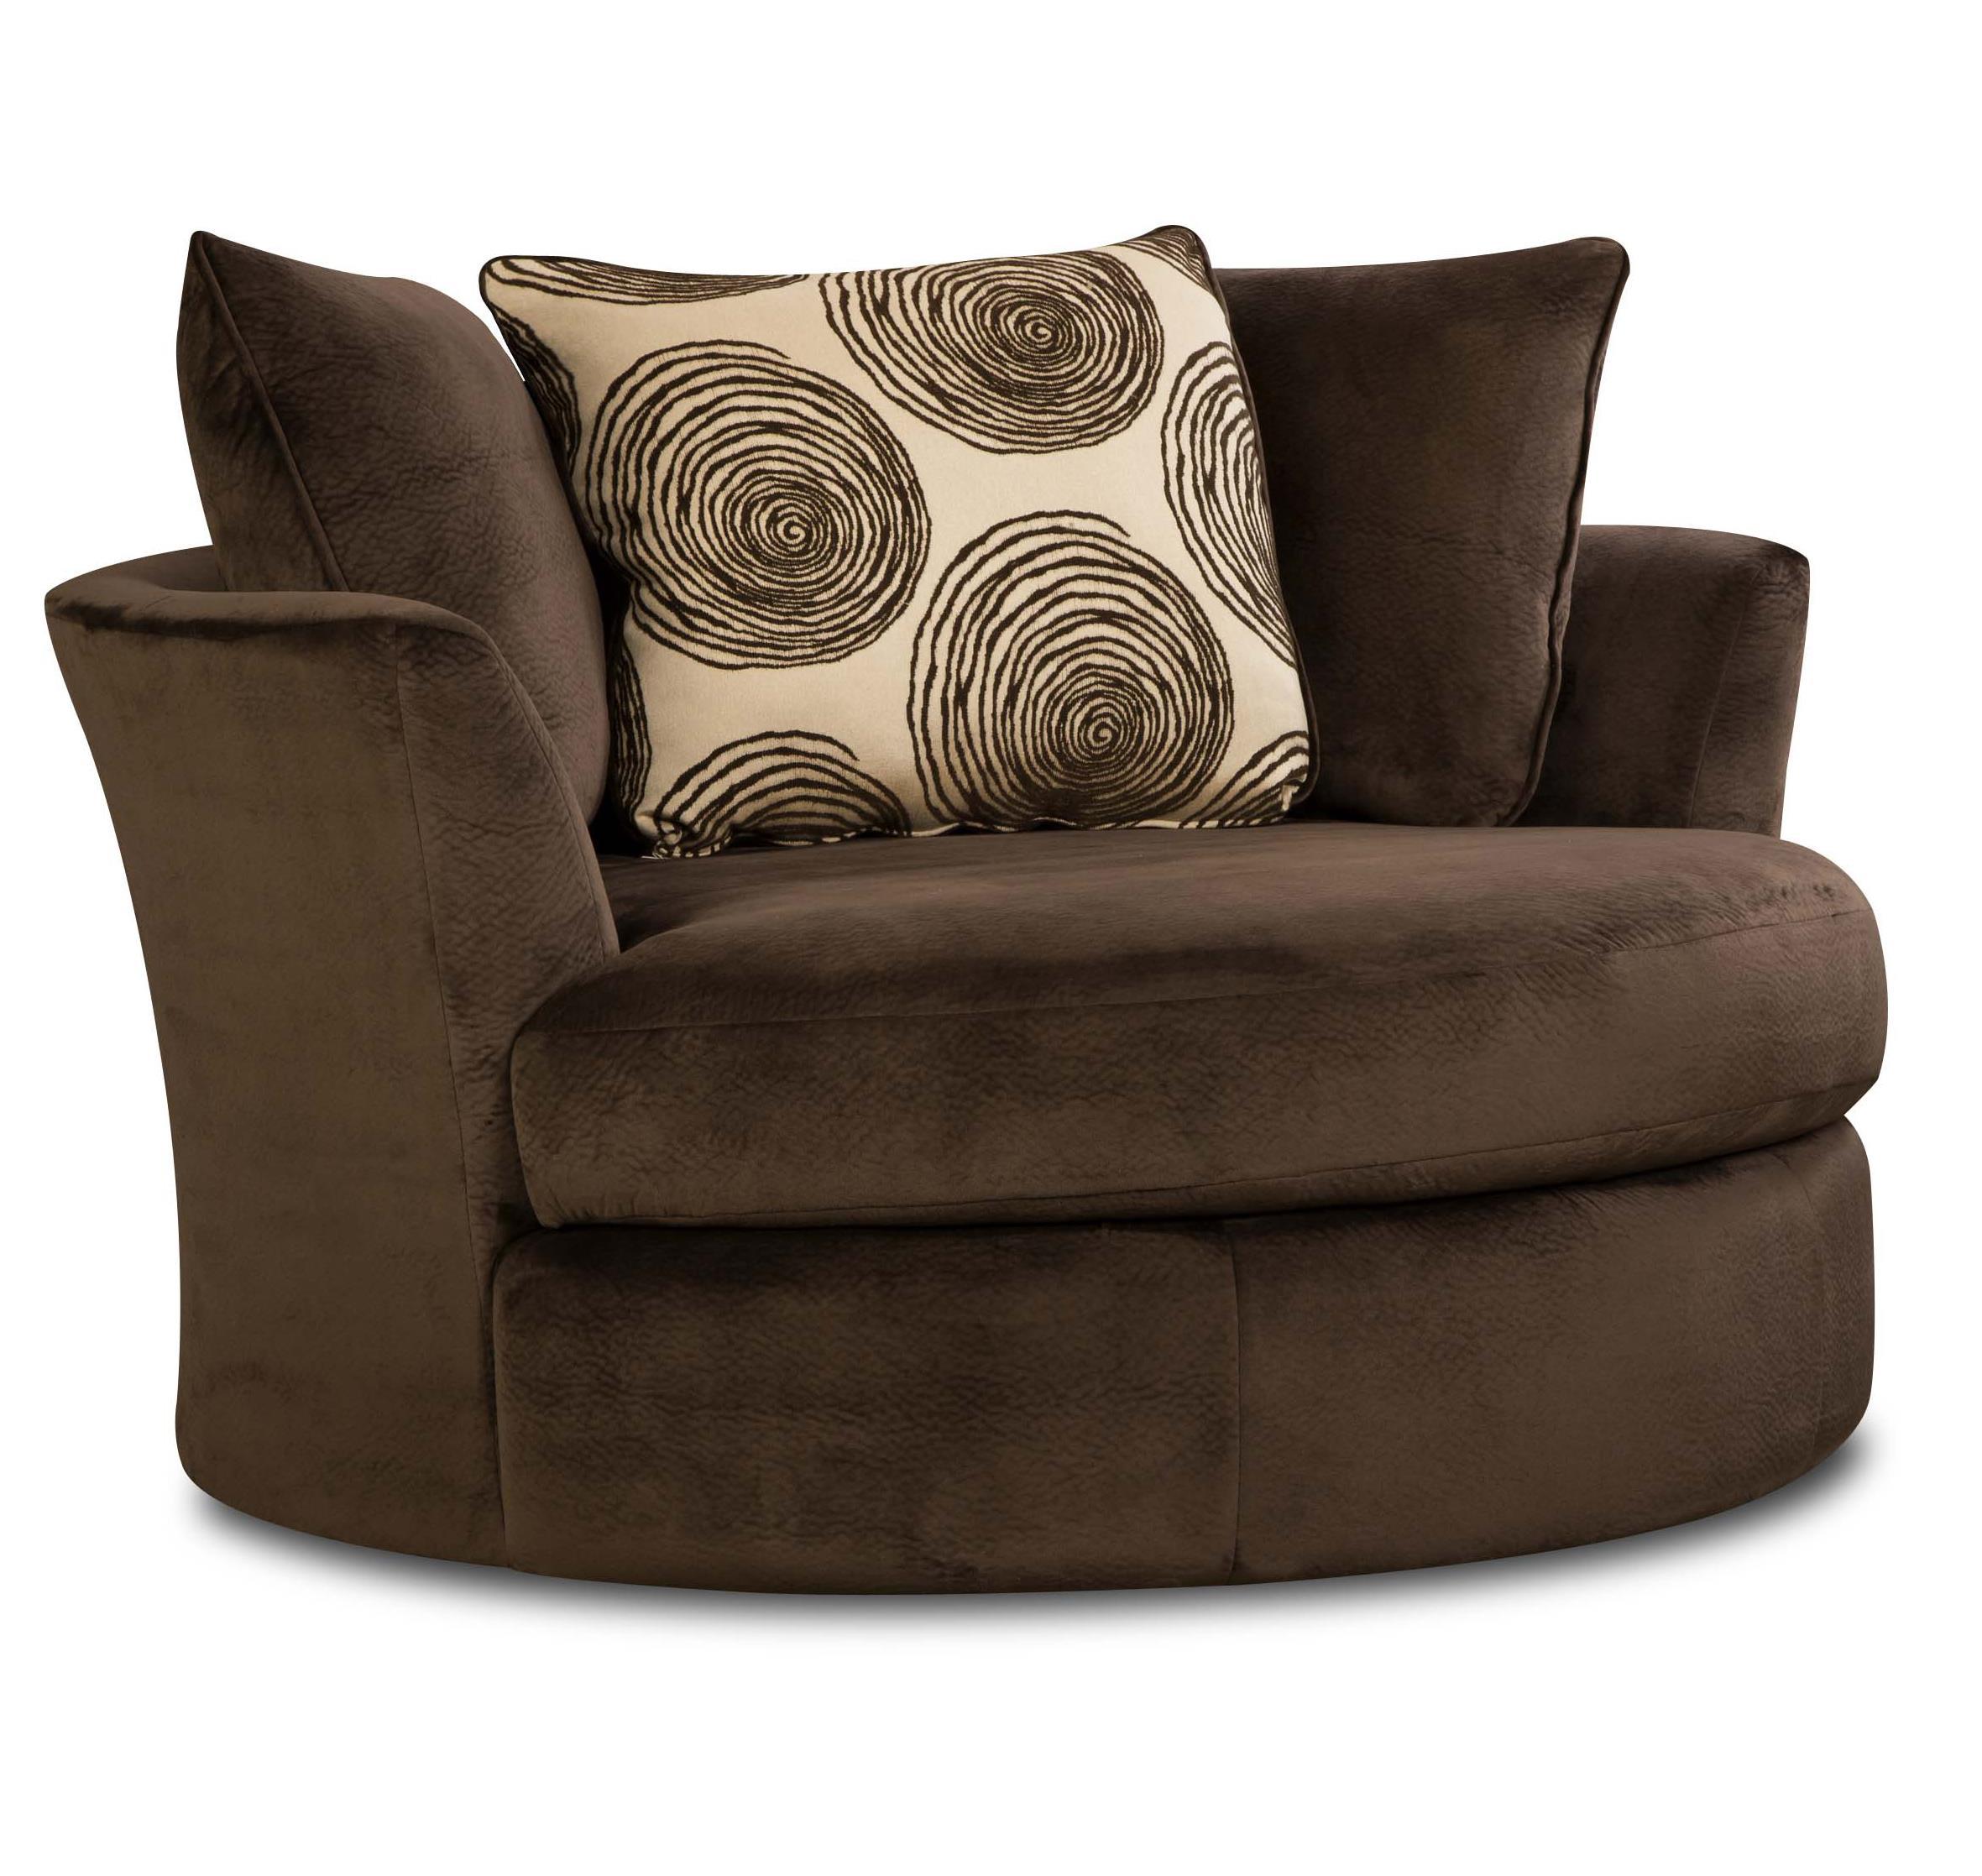 8642 Transitional Swivel Chair by Albany at Furniture Fair - North Carolina